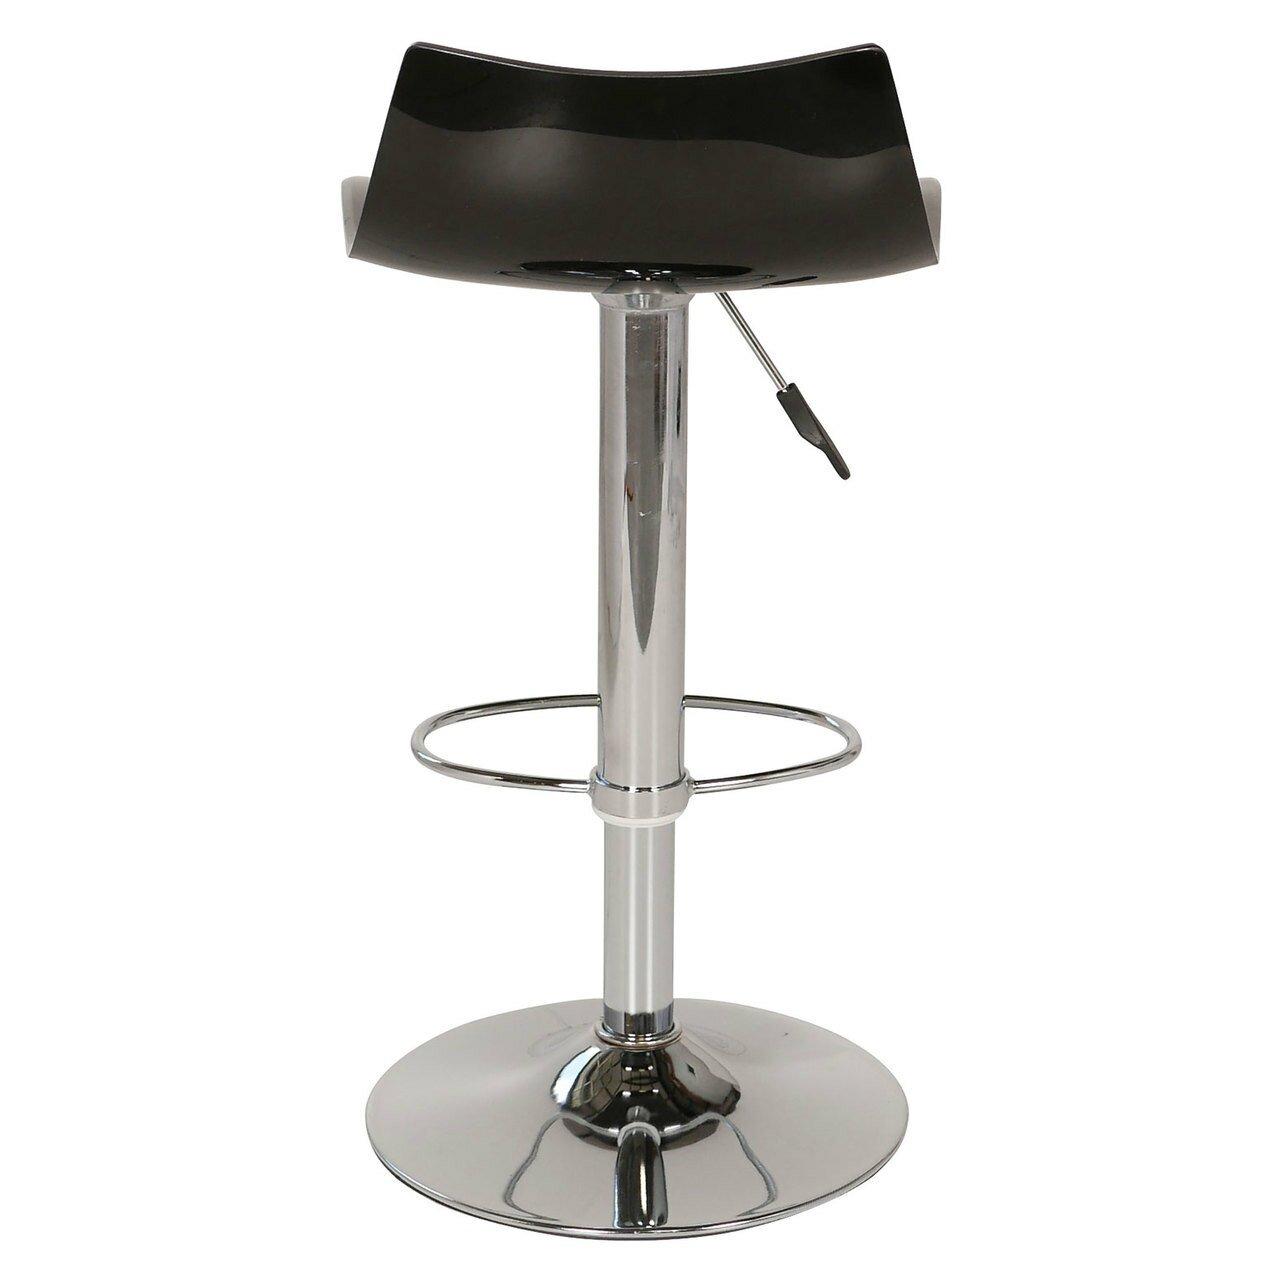 joseph allen lucite adjustable height swivel bar stool